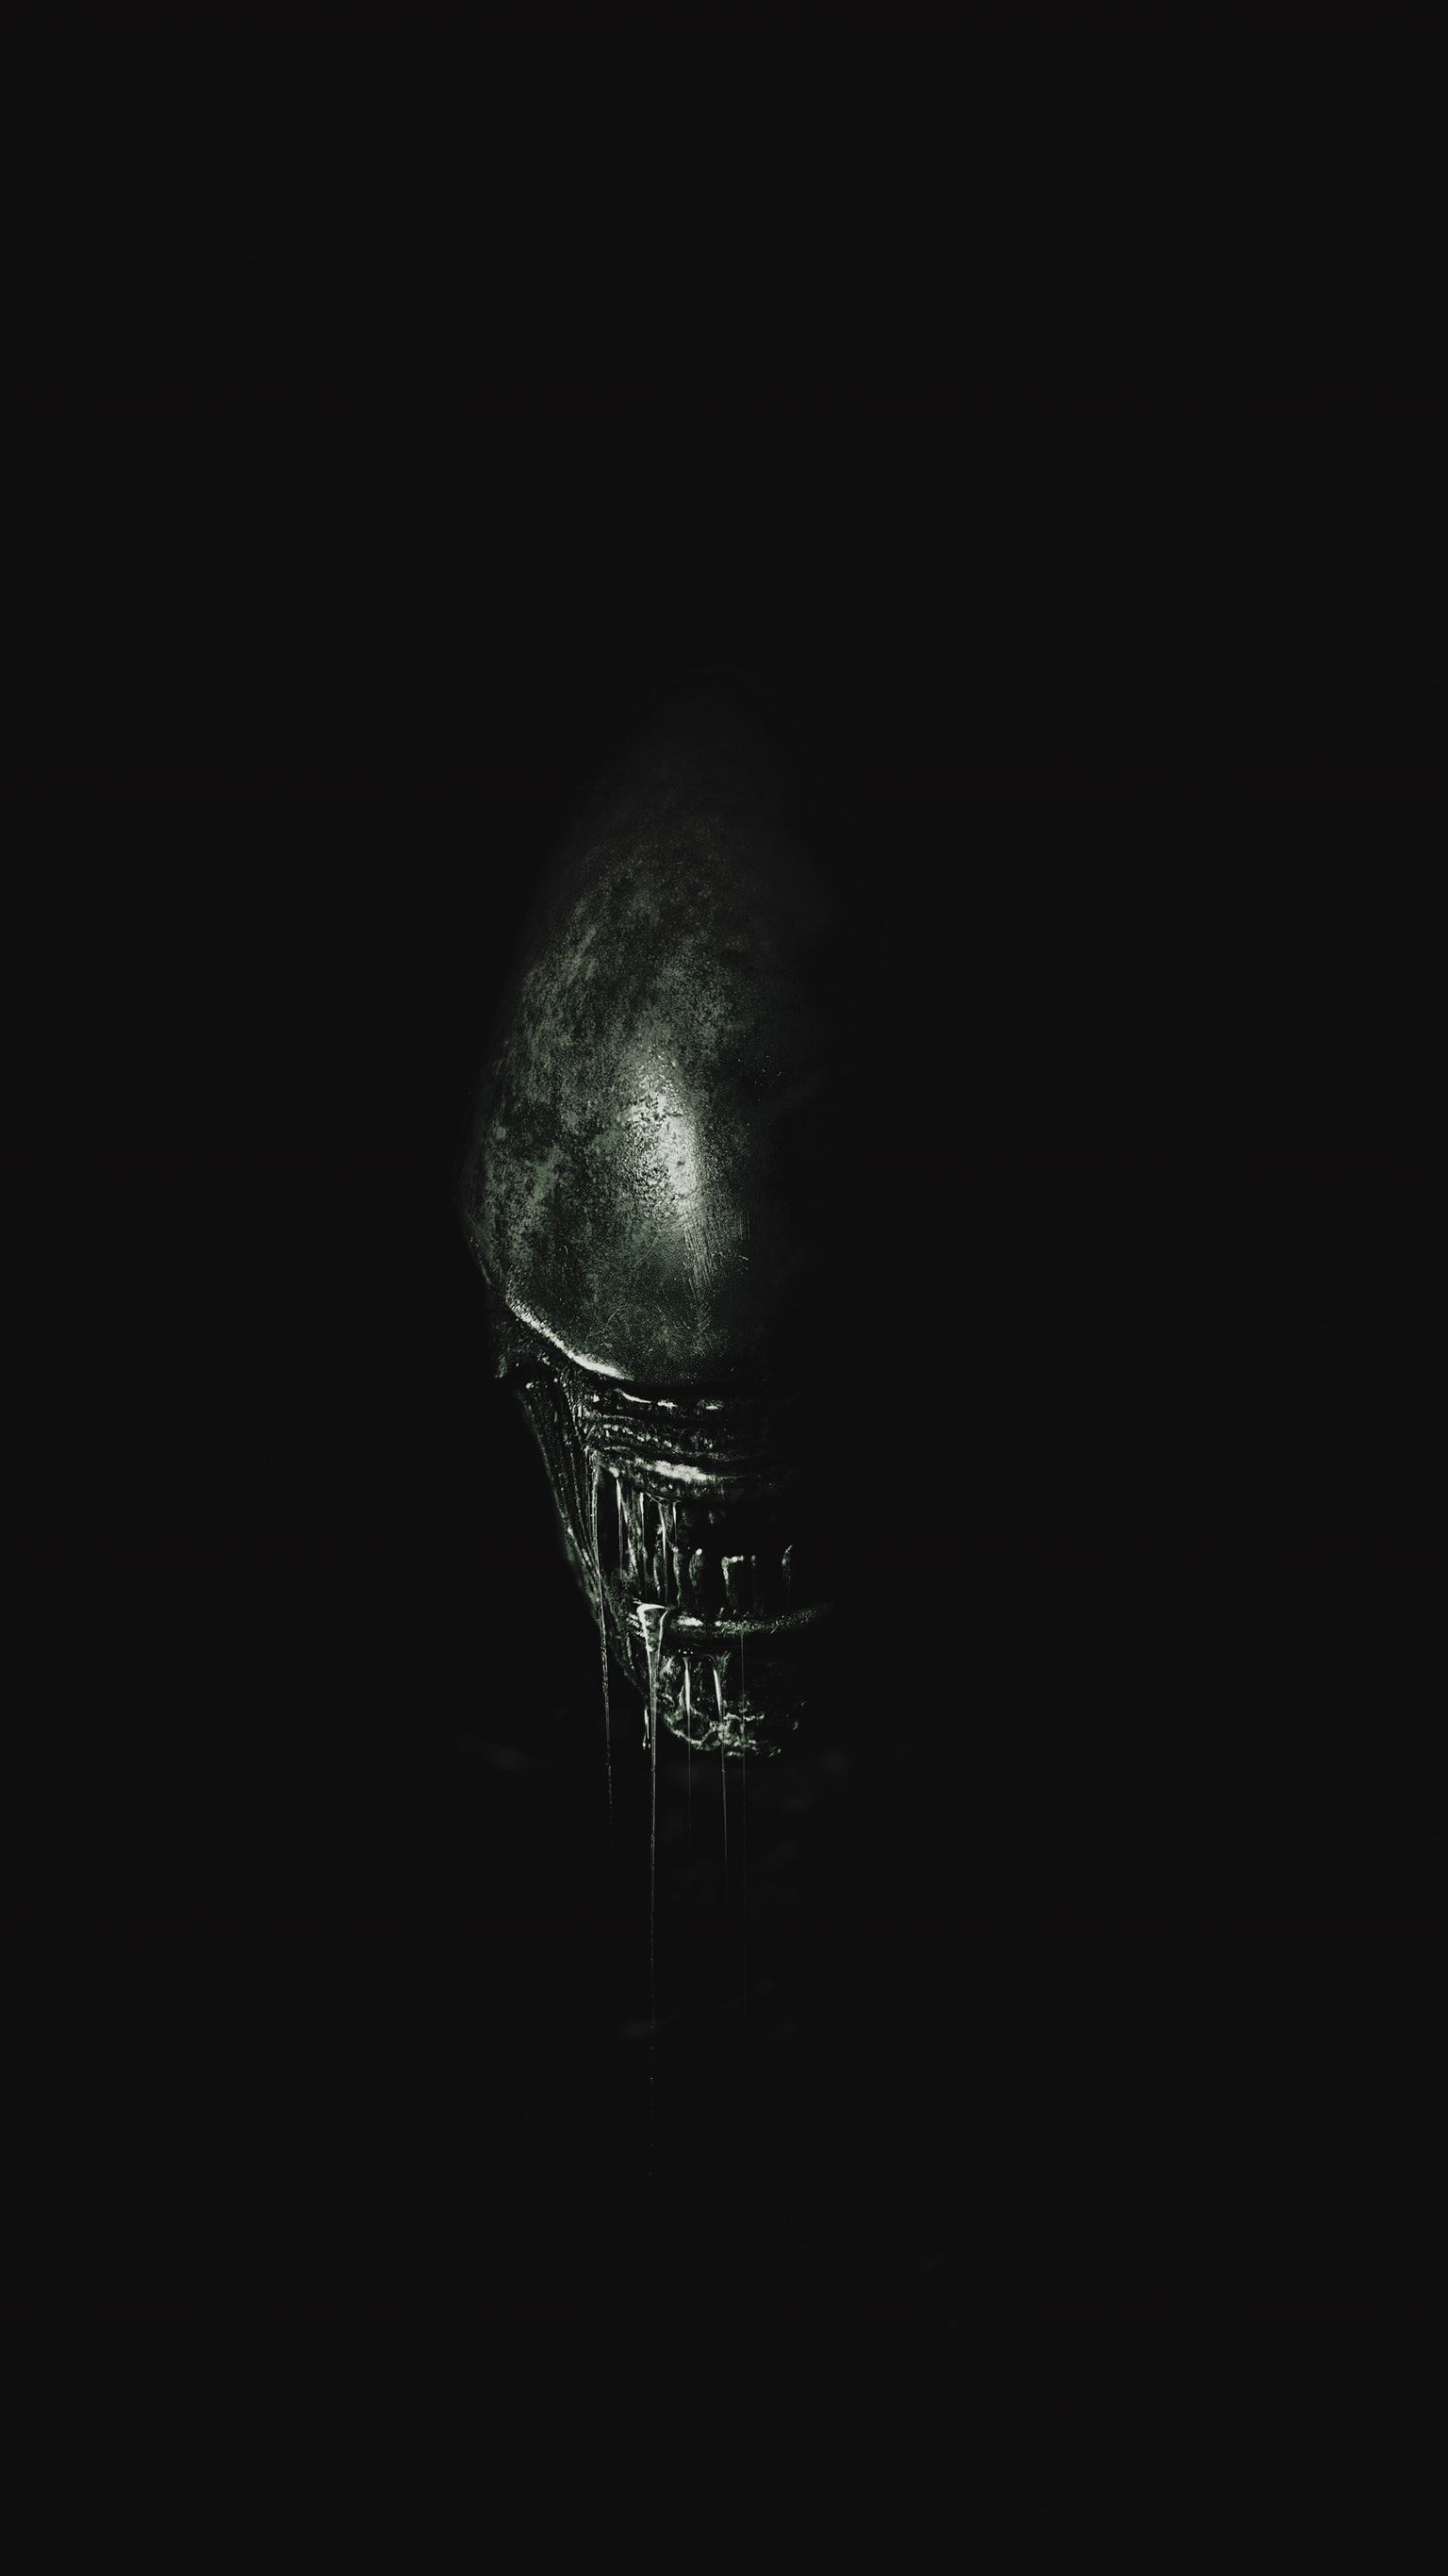 Alien Covenant 2017 Phone Wallpaper Moviemania Aliens Movie Tattoo Alien Artwork Alien